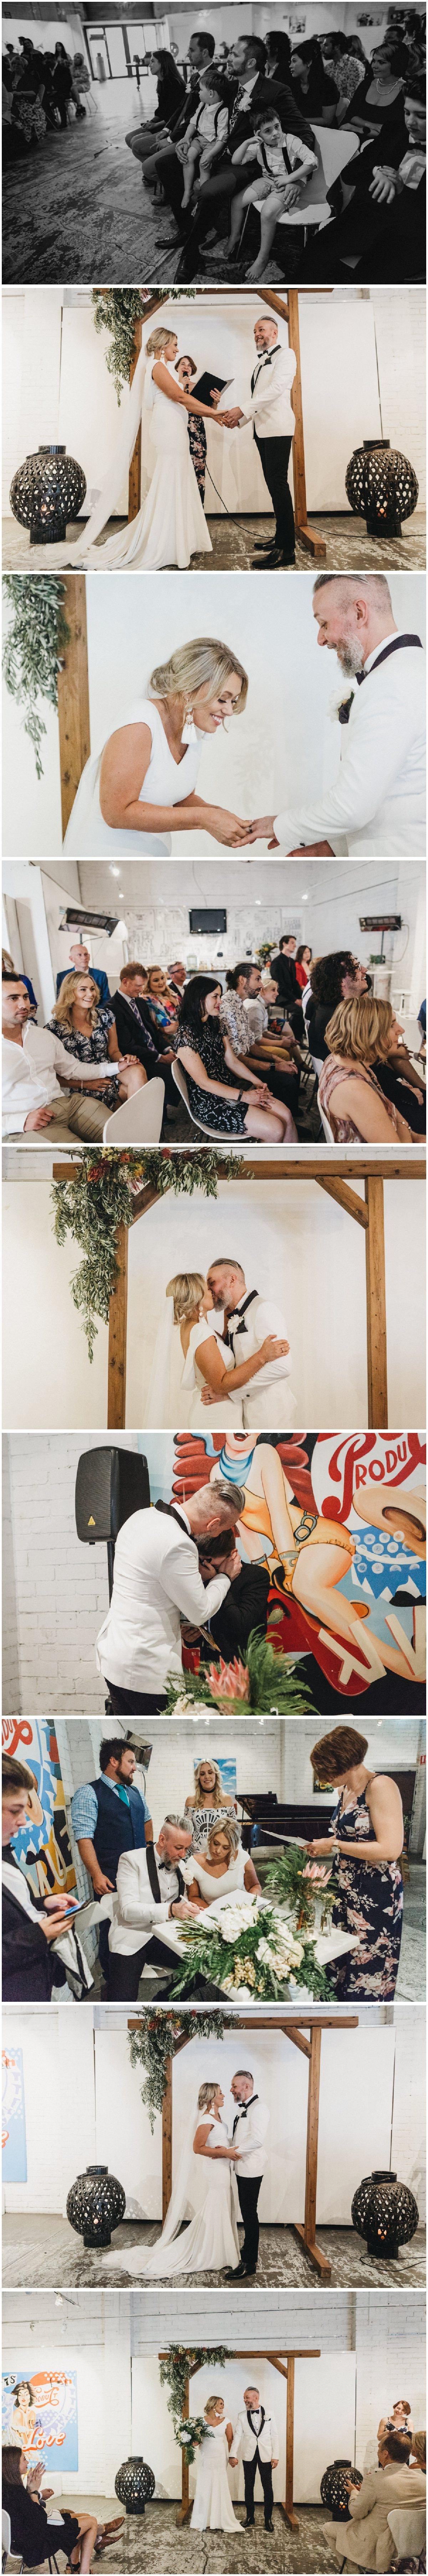 Emily_Tim_Melbourne_Beach_city_wedding_103.jpg